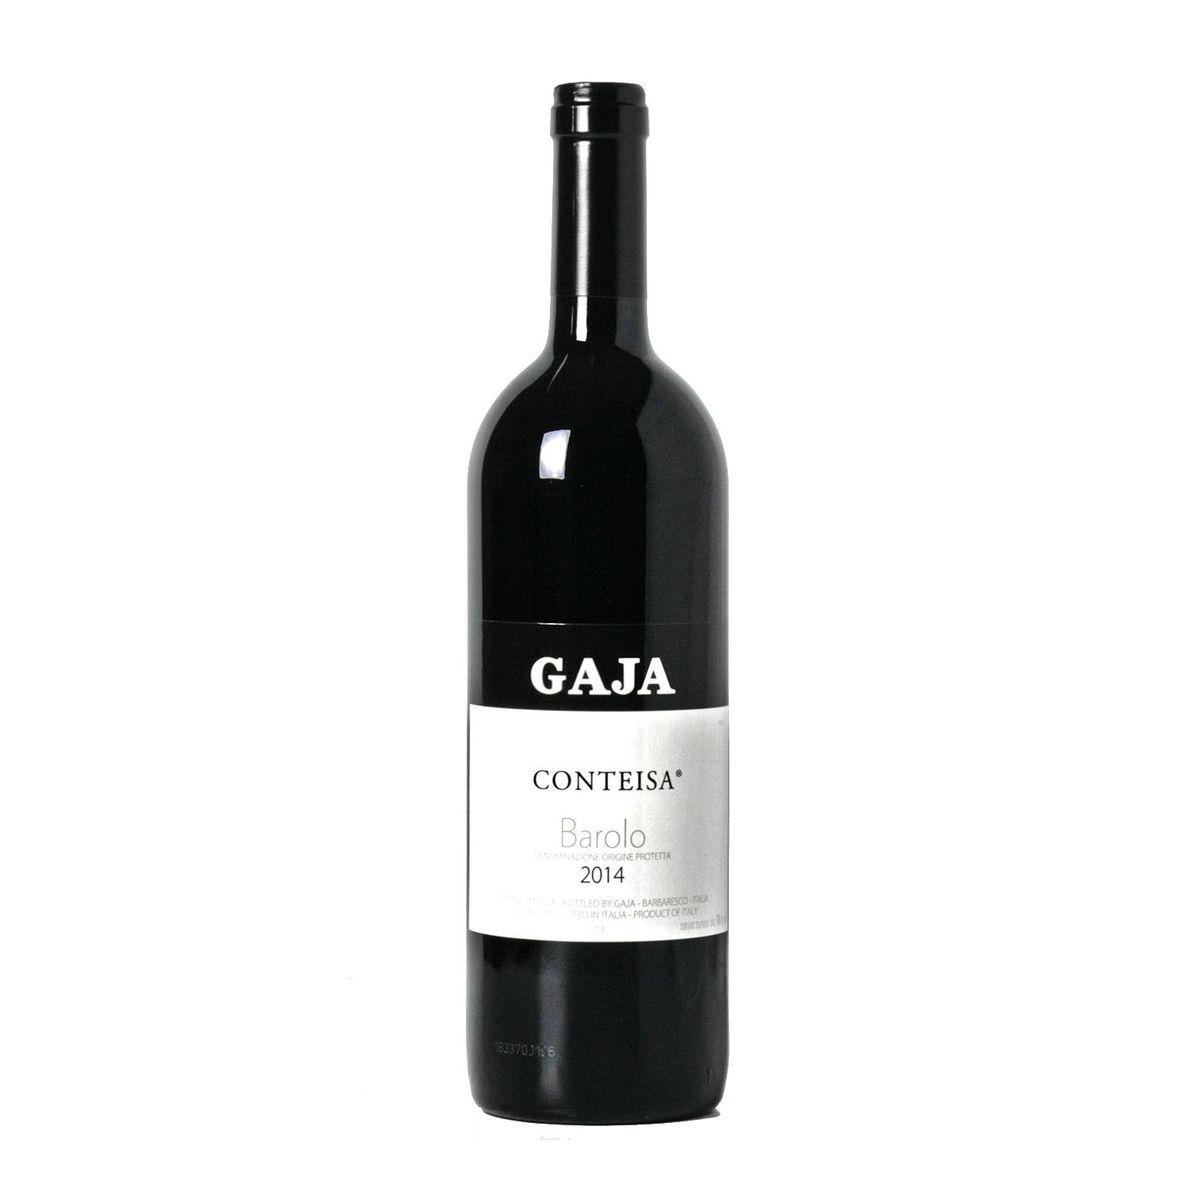 Conteisa 2014 Gaja